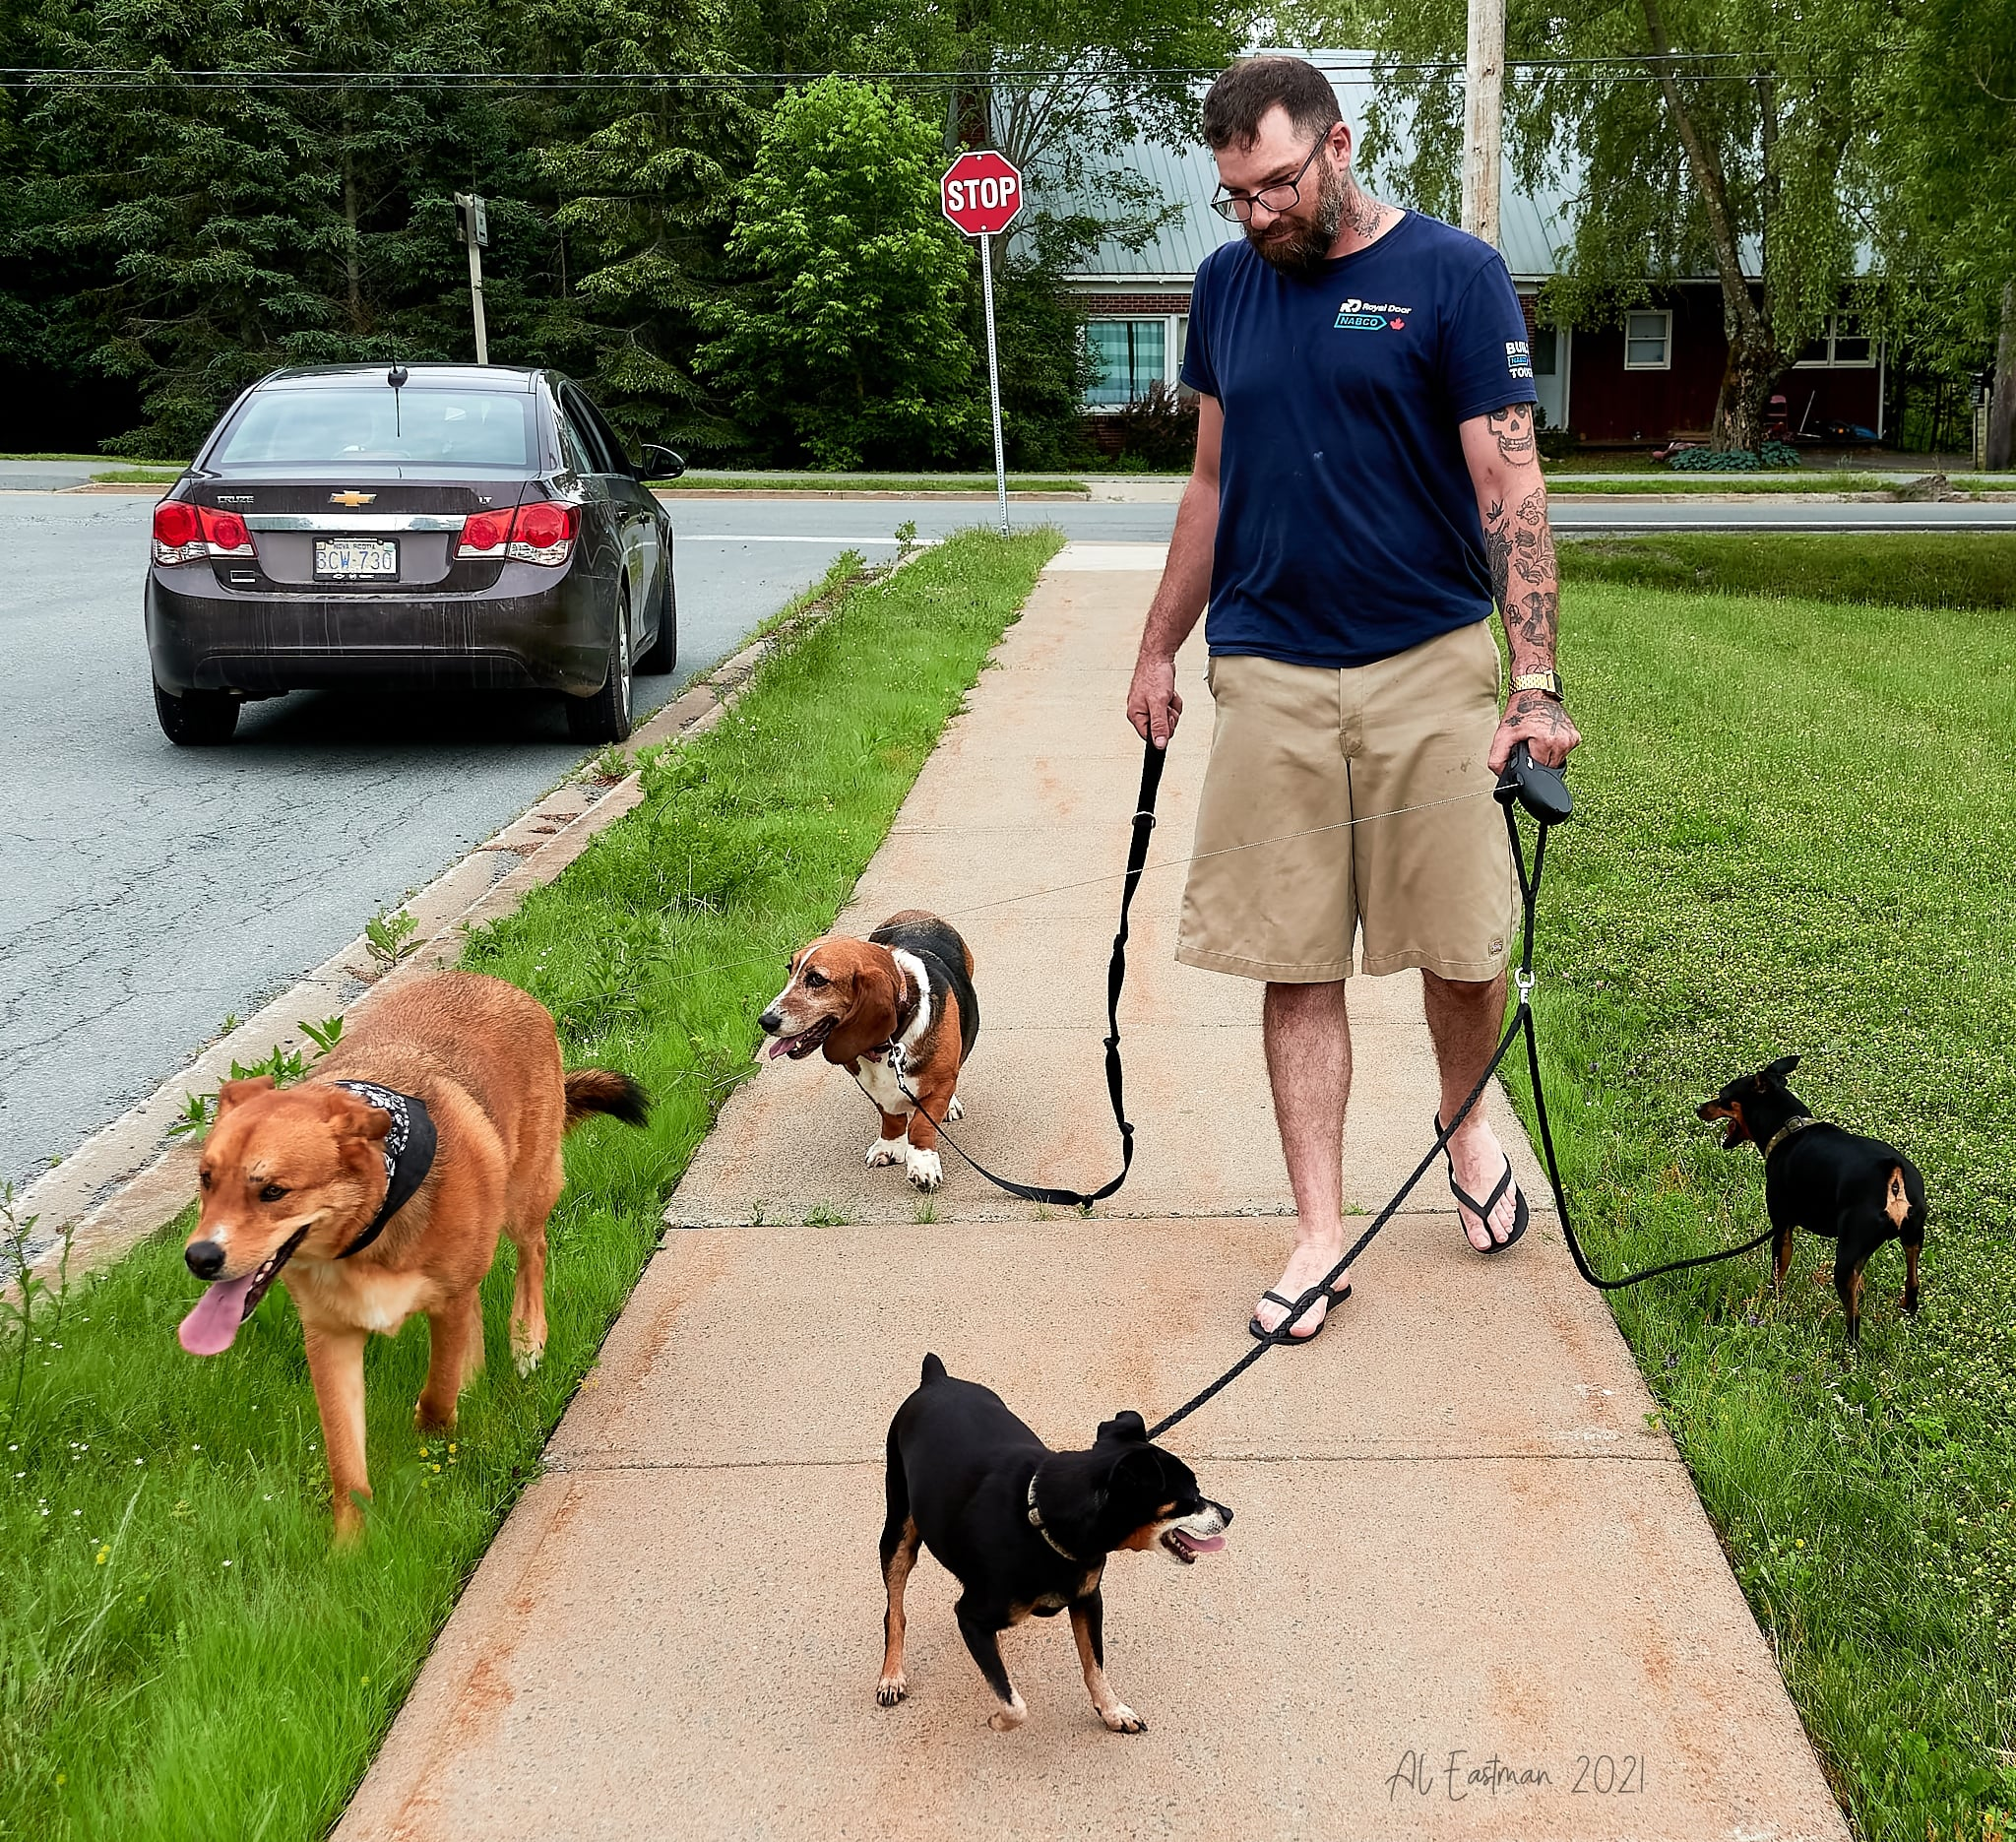 Hombre descubre a 2 perros en un accidente